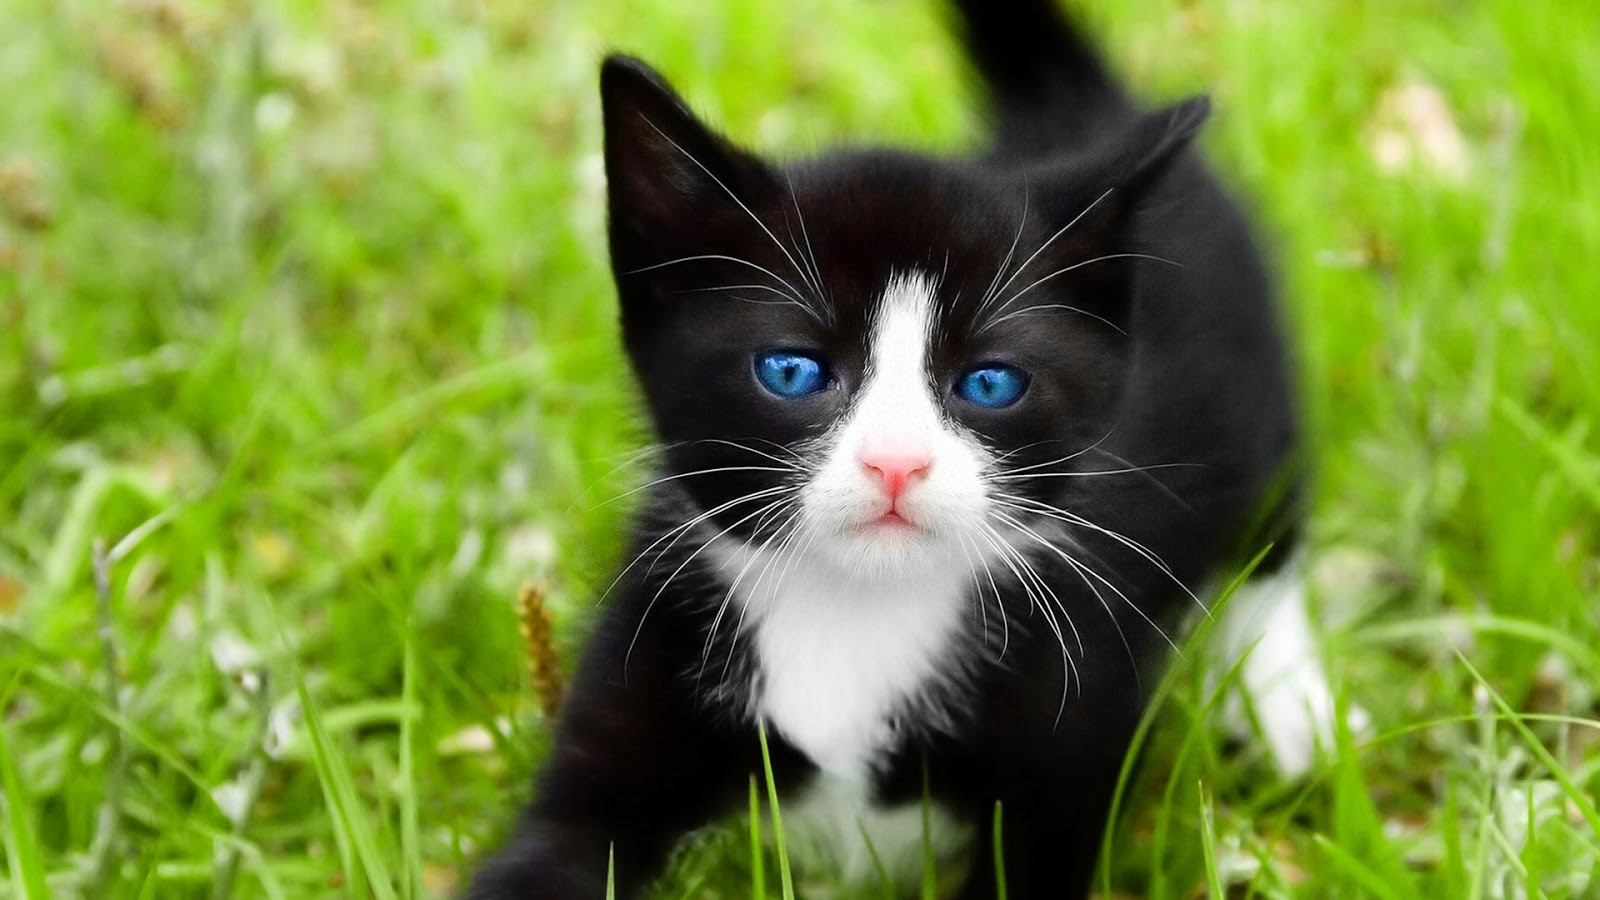 Black Kitten with Blue Eyes | Full HD Desktop Wallpapers 1080p